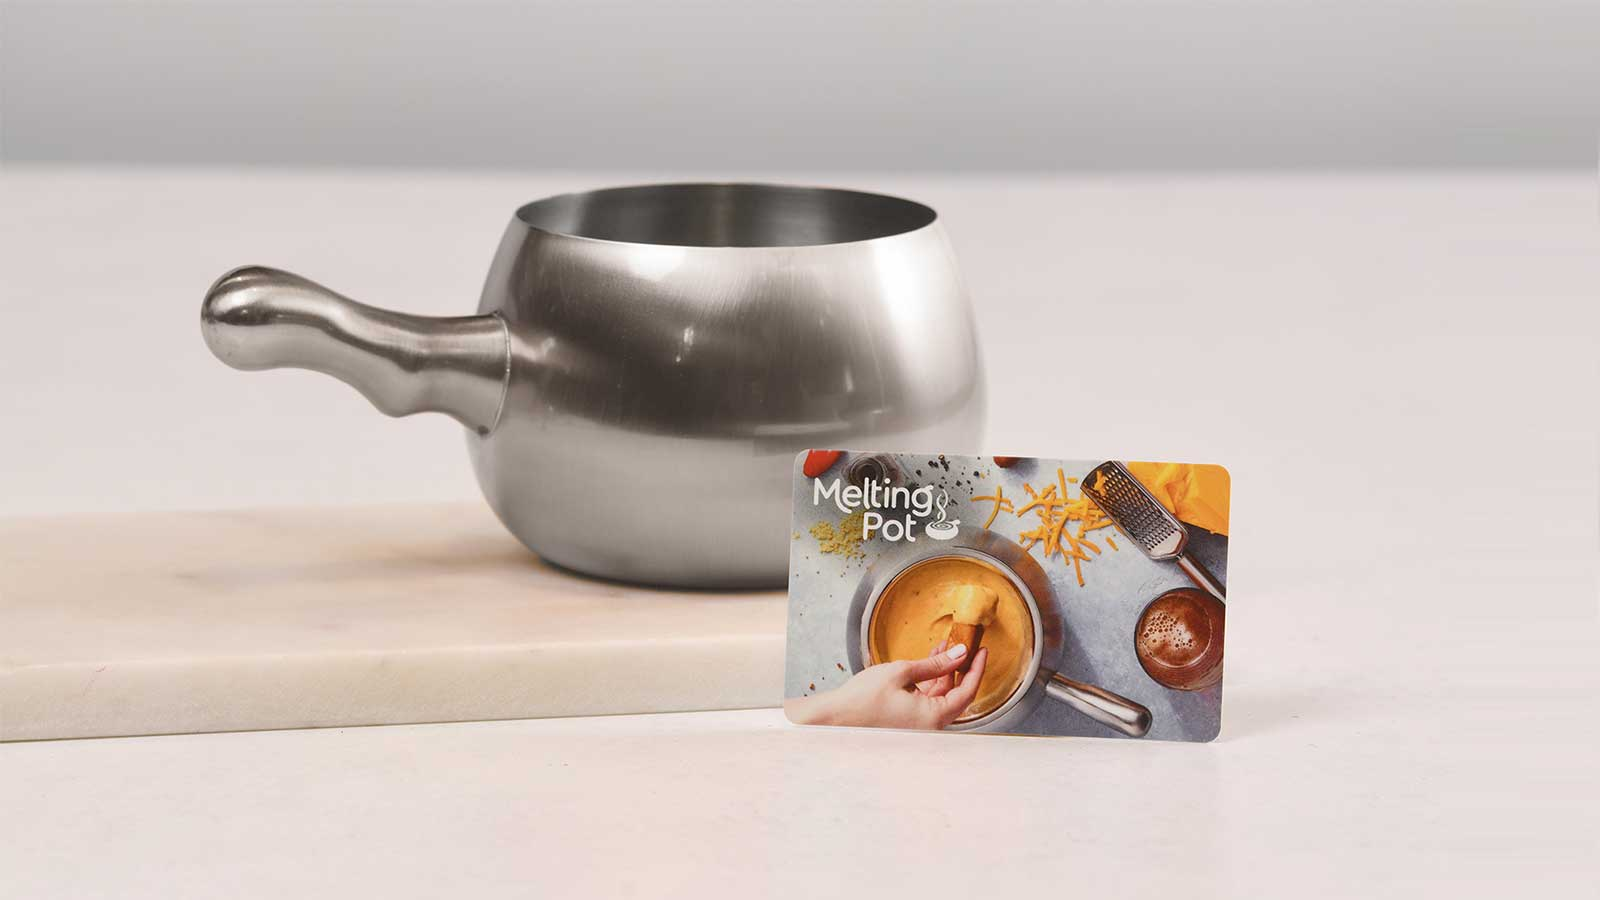 Melting Pot Gift Card and Melting Pot Mule Mug